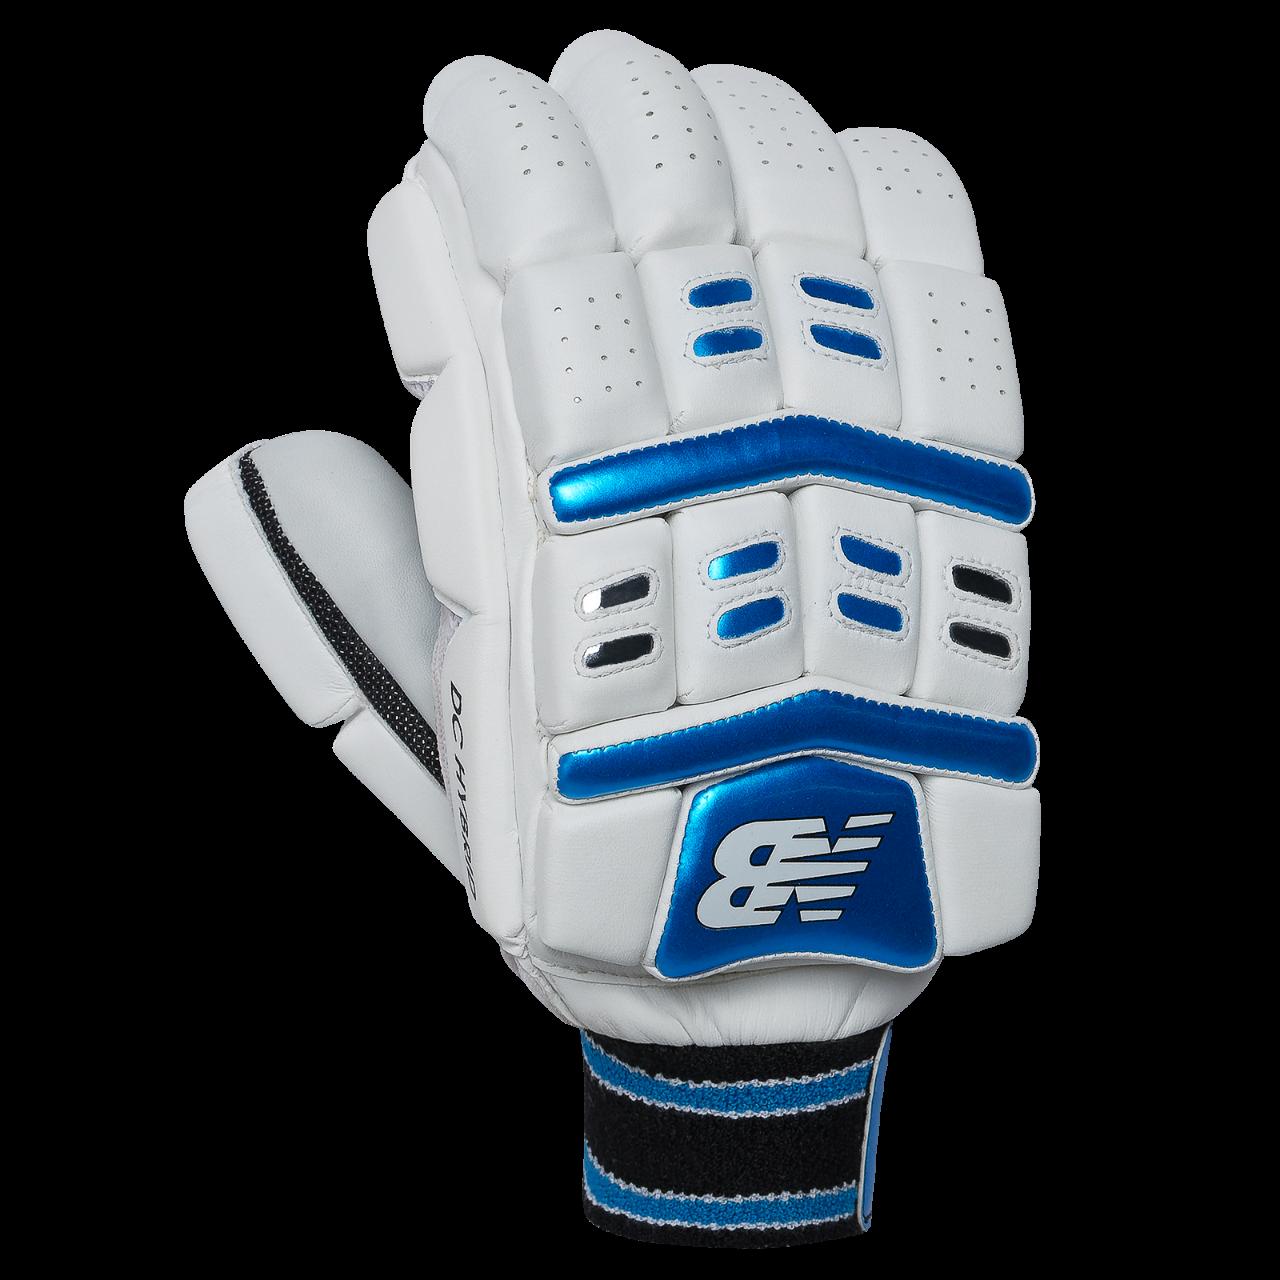 2021 New Balance DC Hybrid Batting Gloves